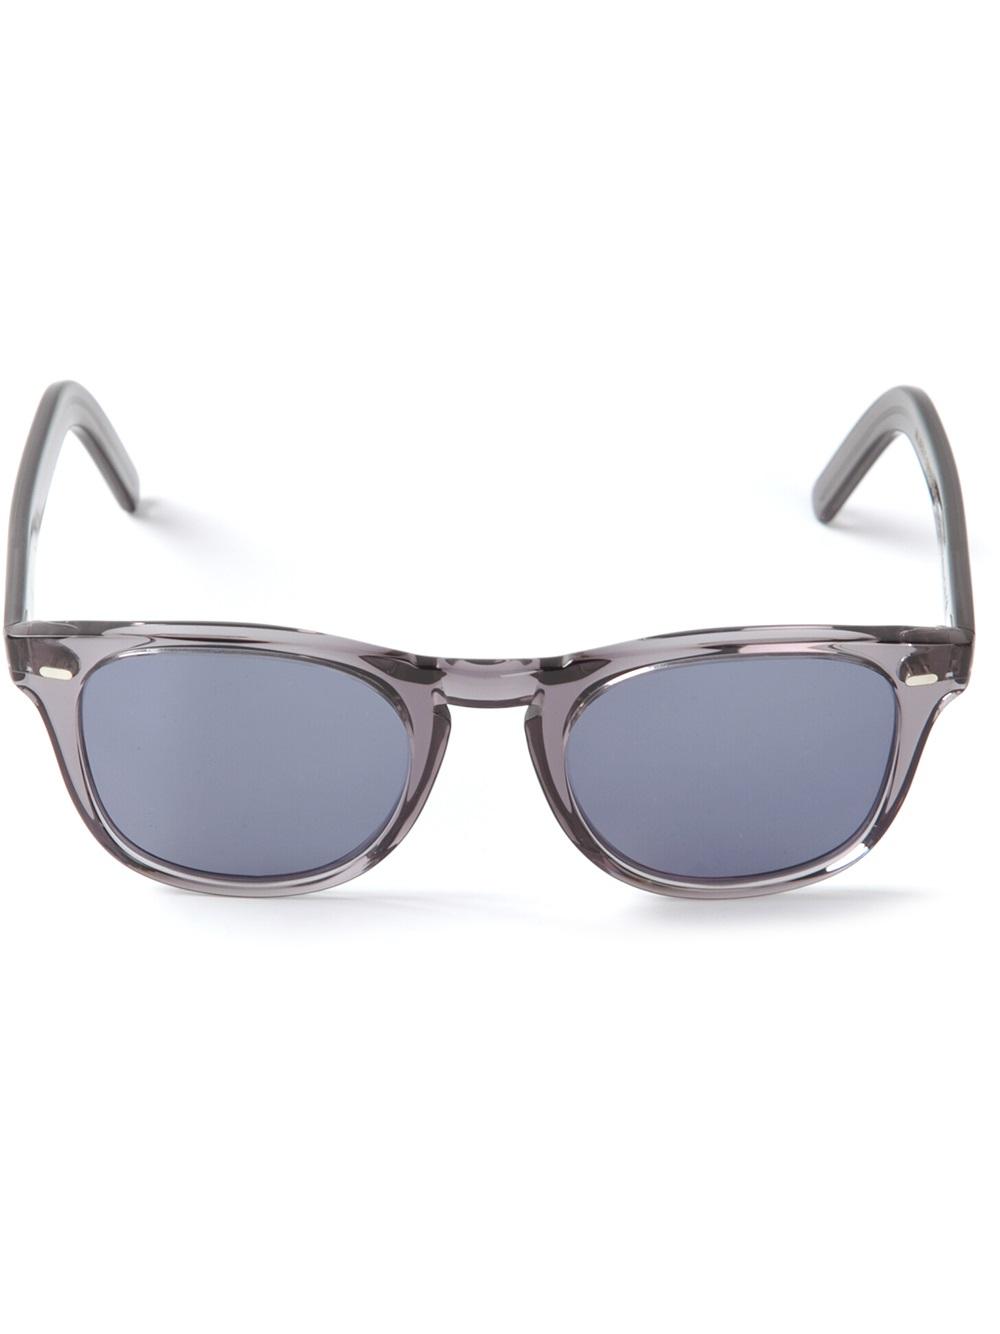 cac5f9134f Cutler   gross Clear Wayfarer Sunglasses in Gray for Men